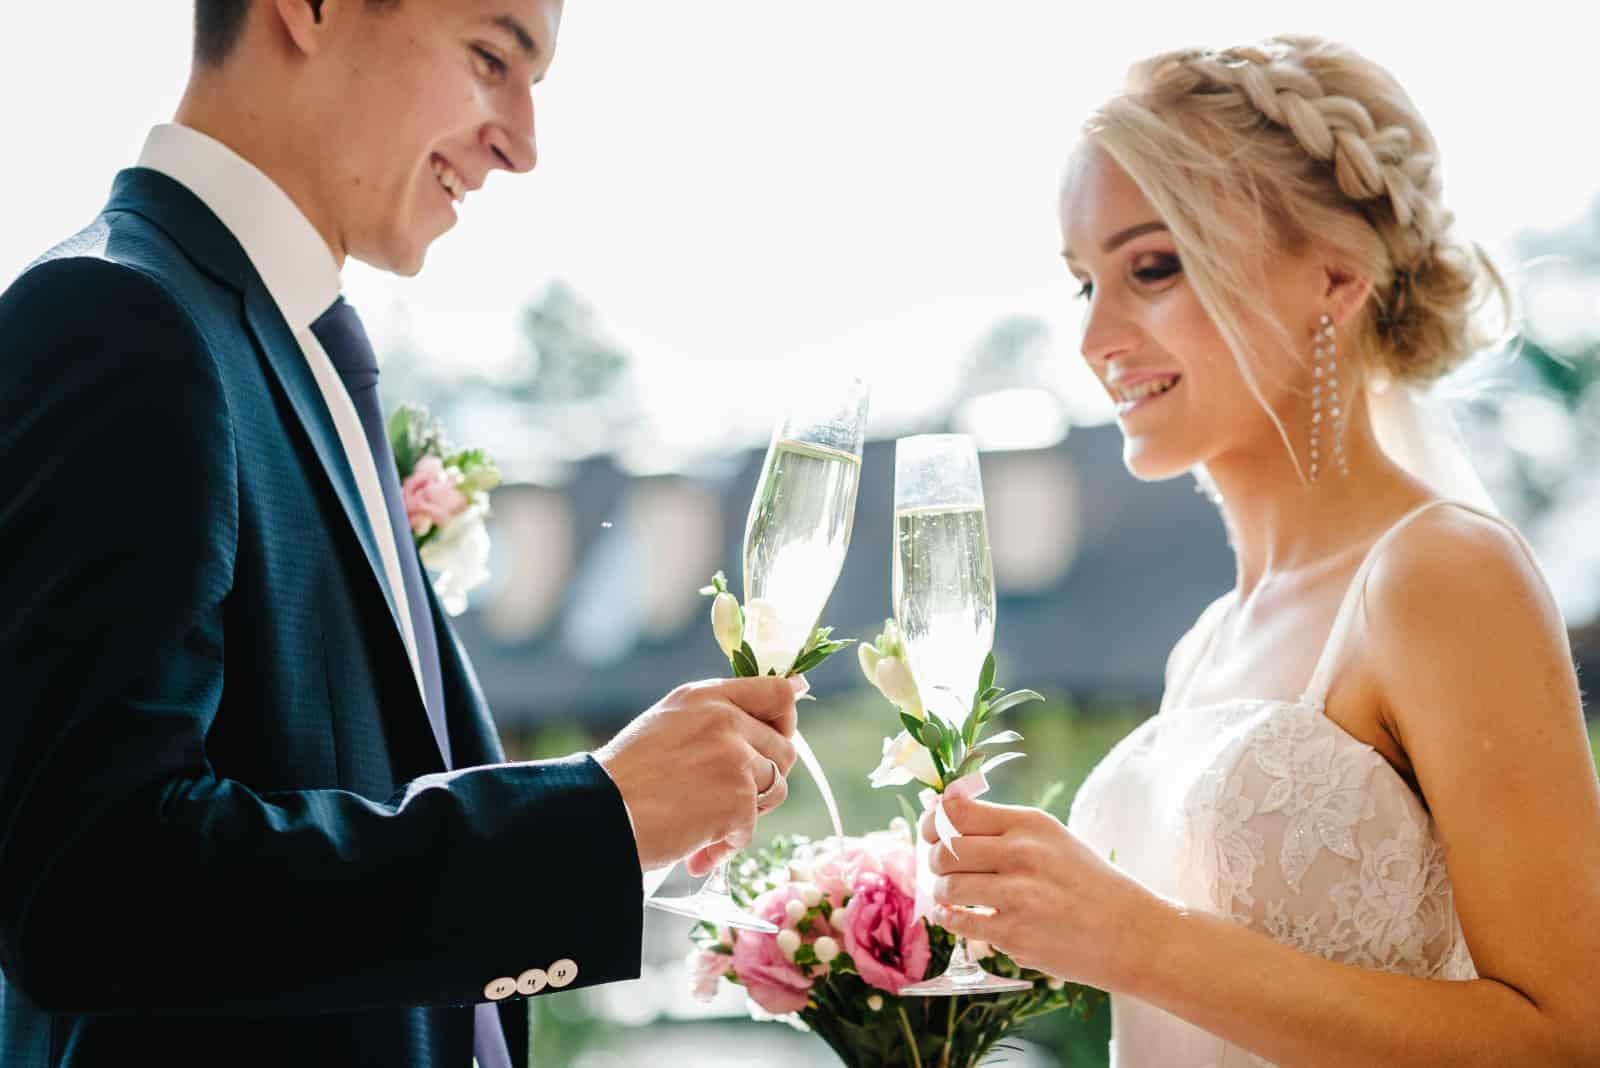 Das Paar stößt bei der Hochzeit an